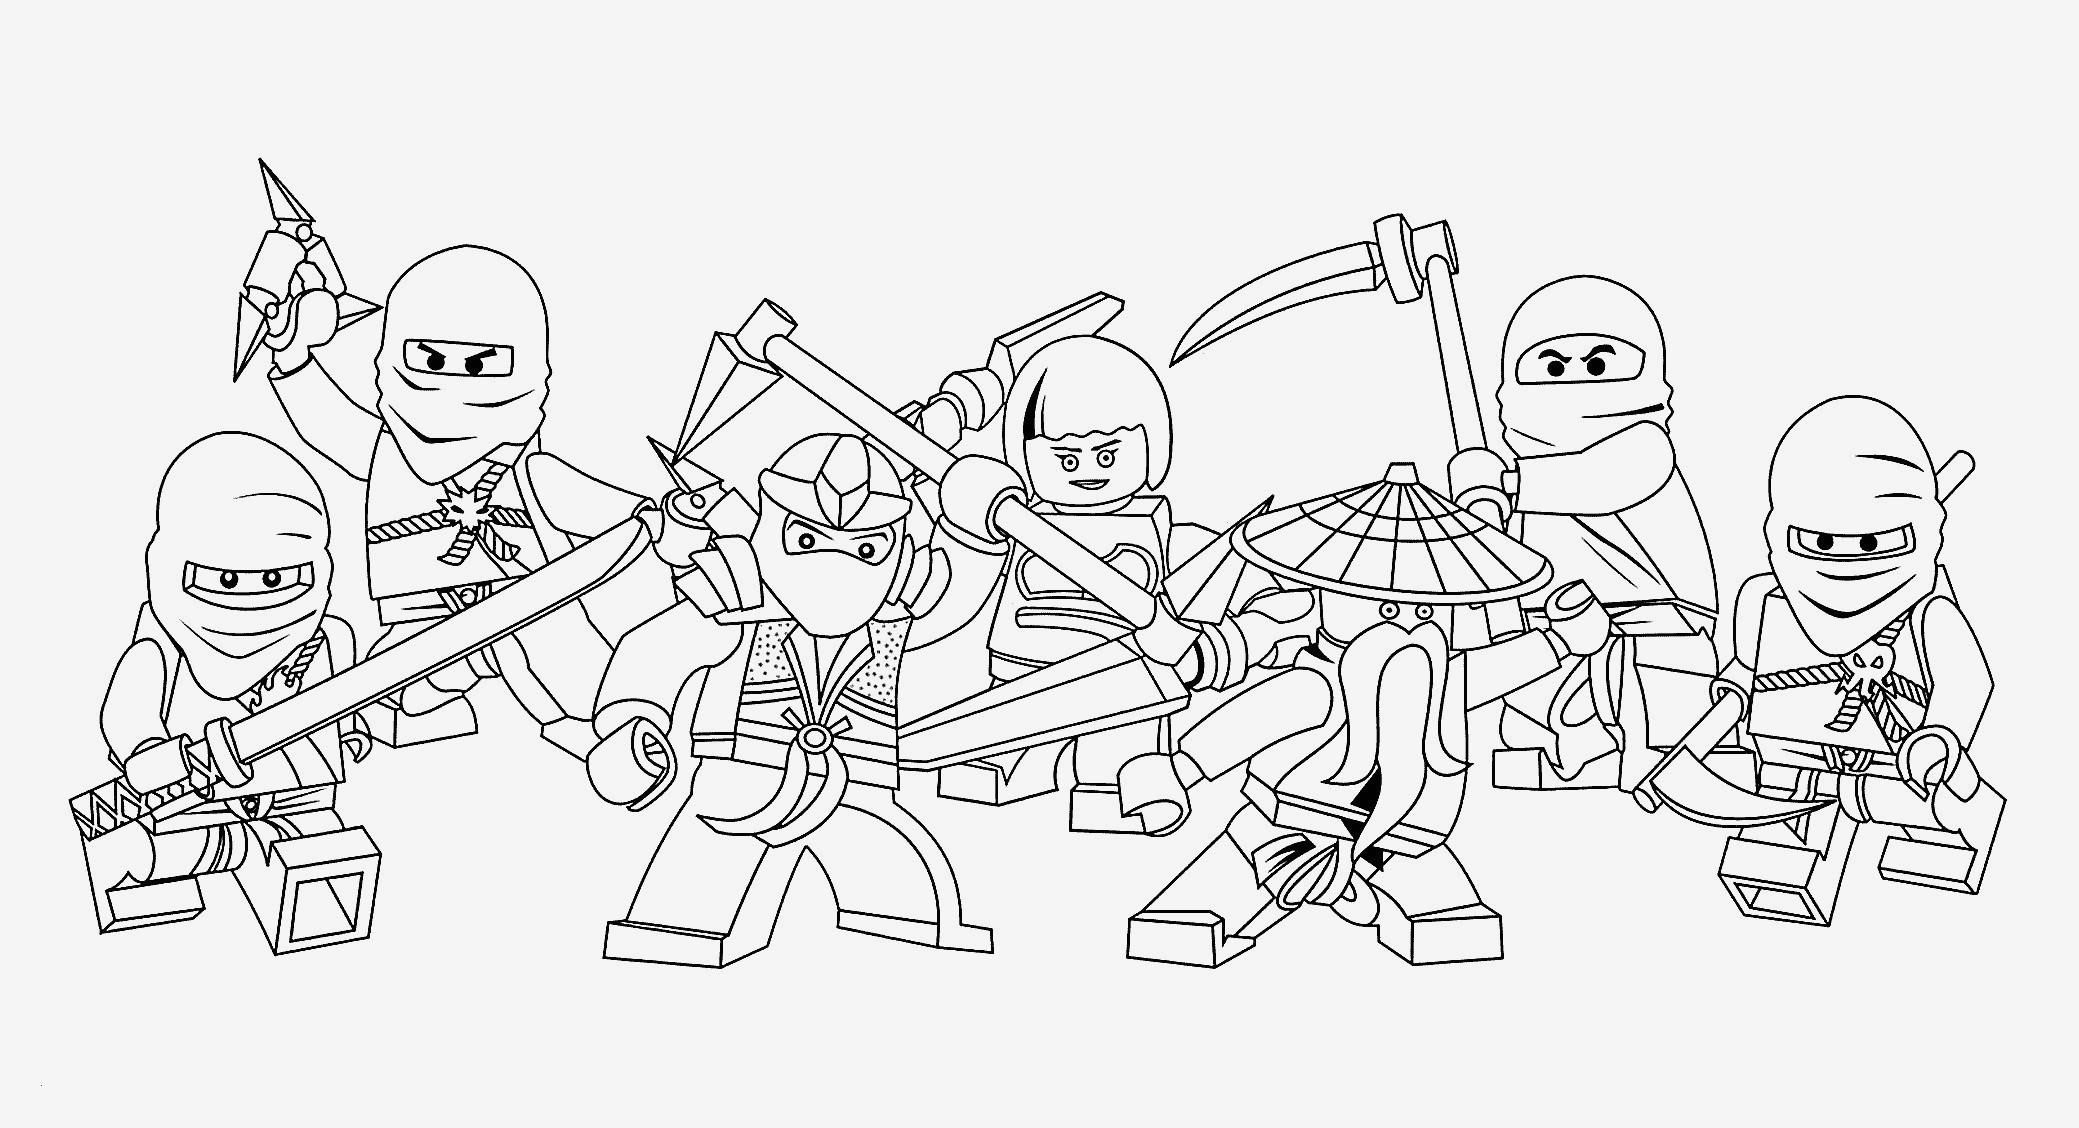 Ausmalbild Ninjago Drache Frisch Bilder Zum Ausmalen Bekommen Ausmalbilder Ninjago Movie Stock